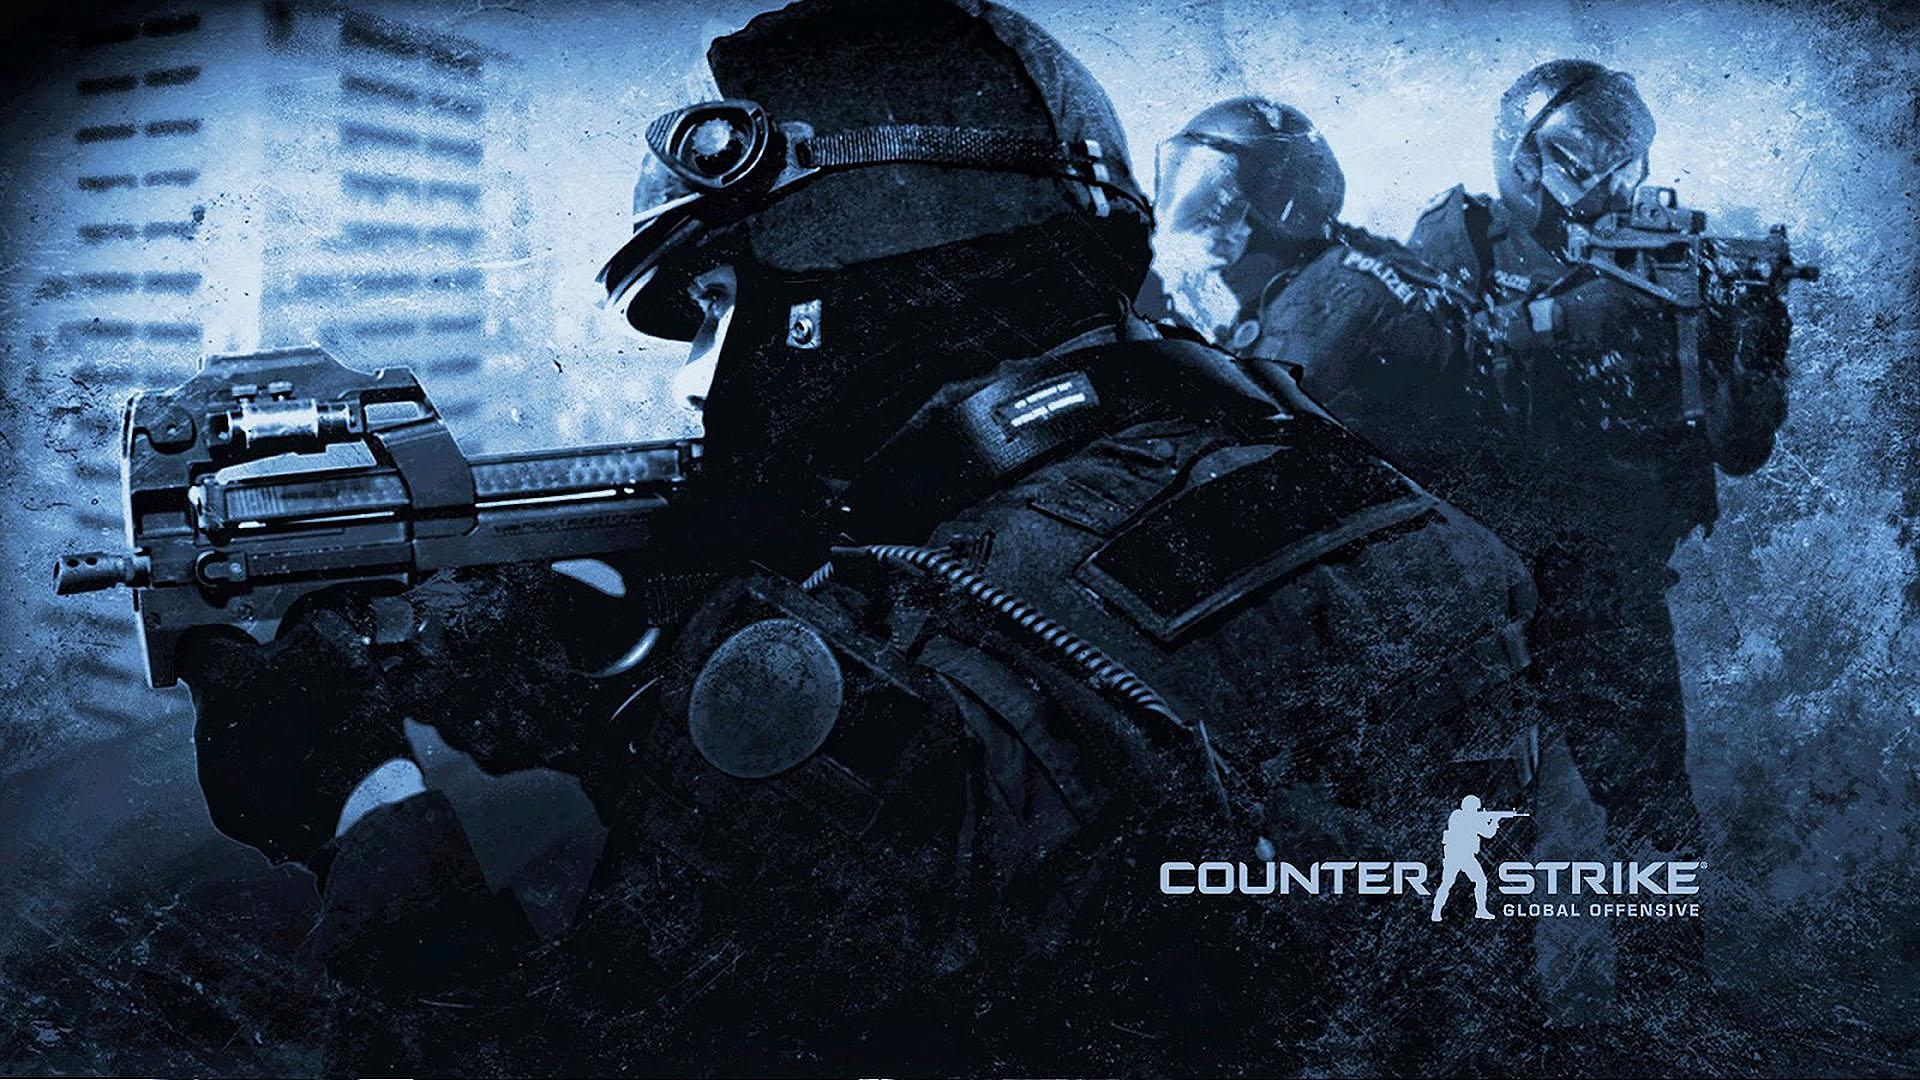 Wallpaper counter strike global offensive cs counter strike 1920x1080